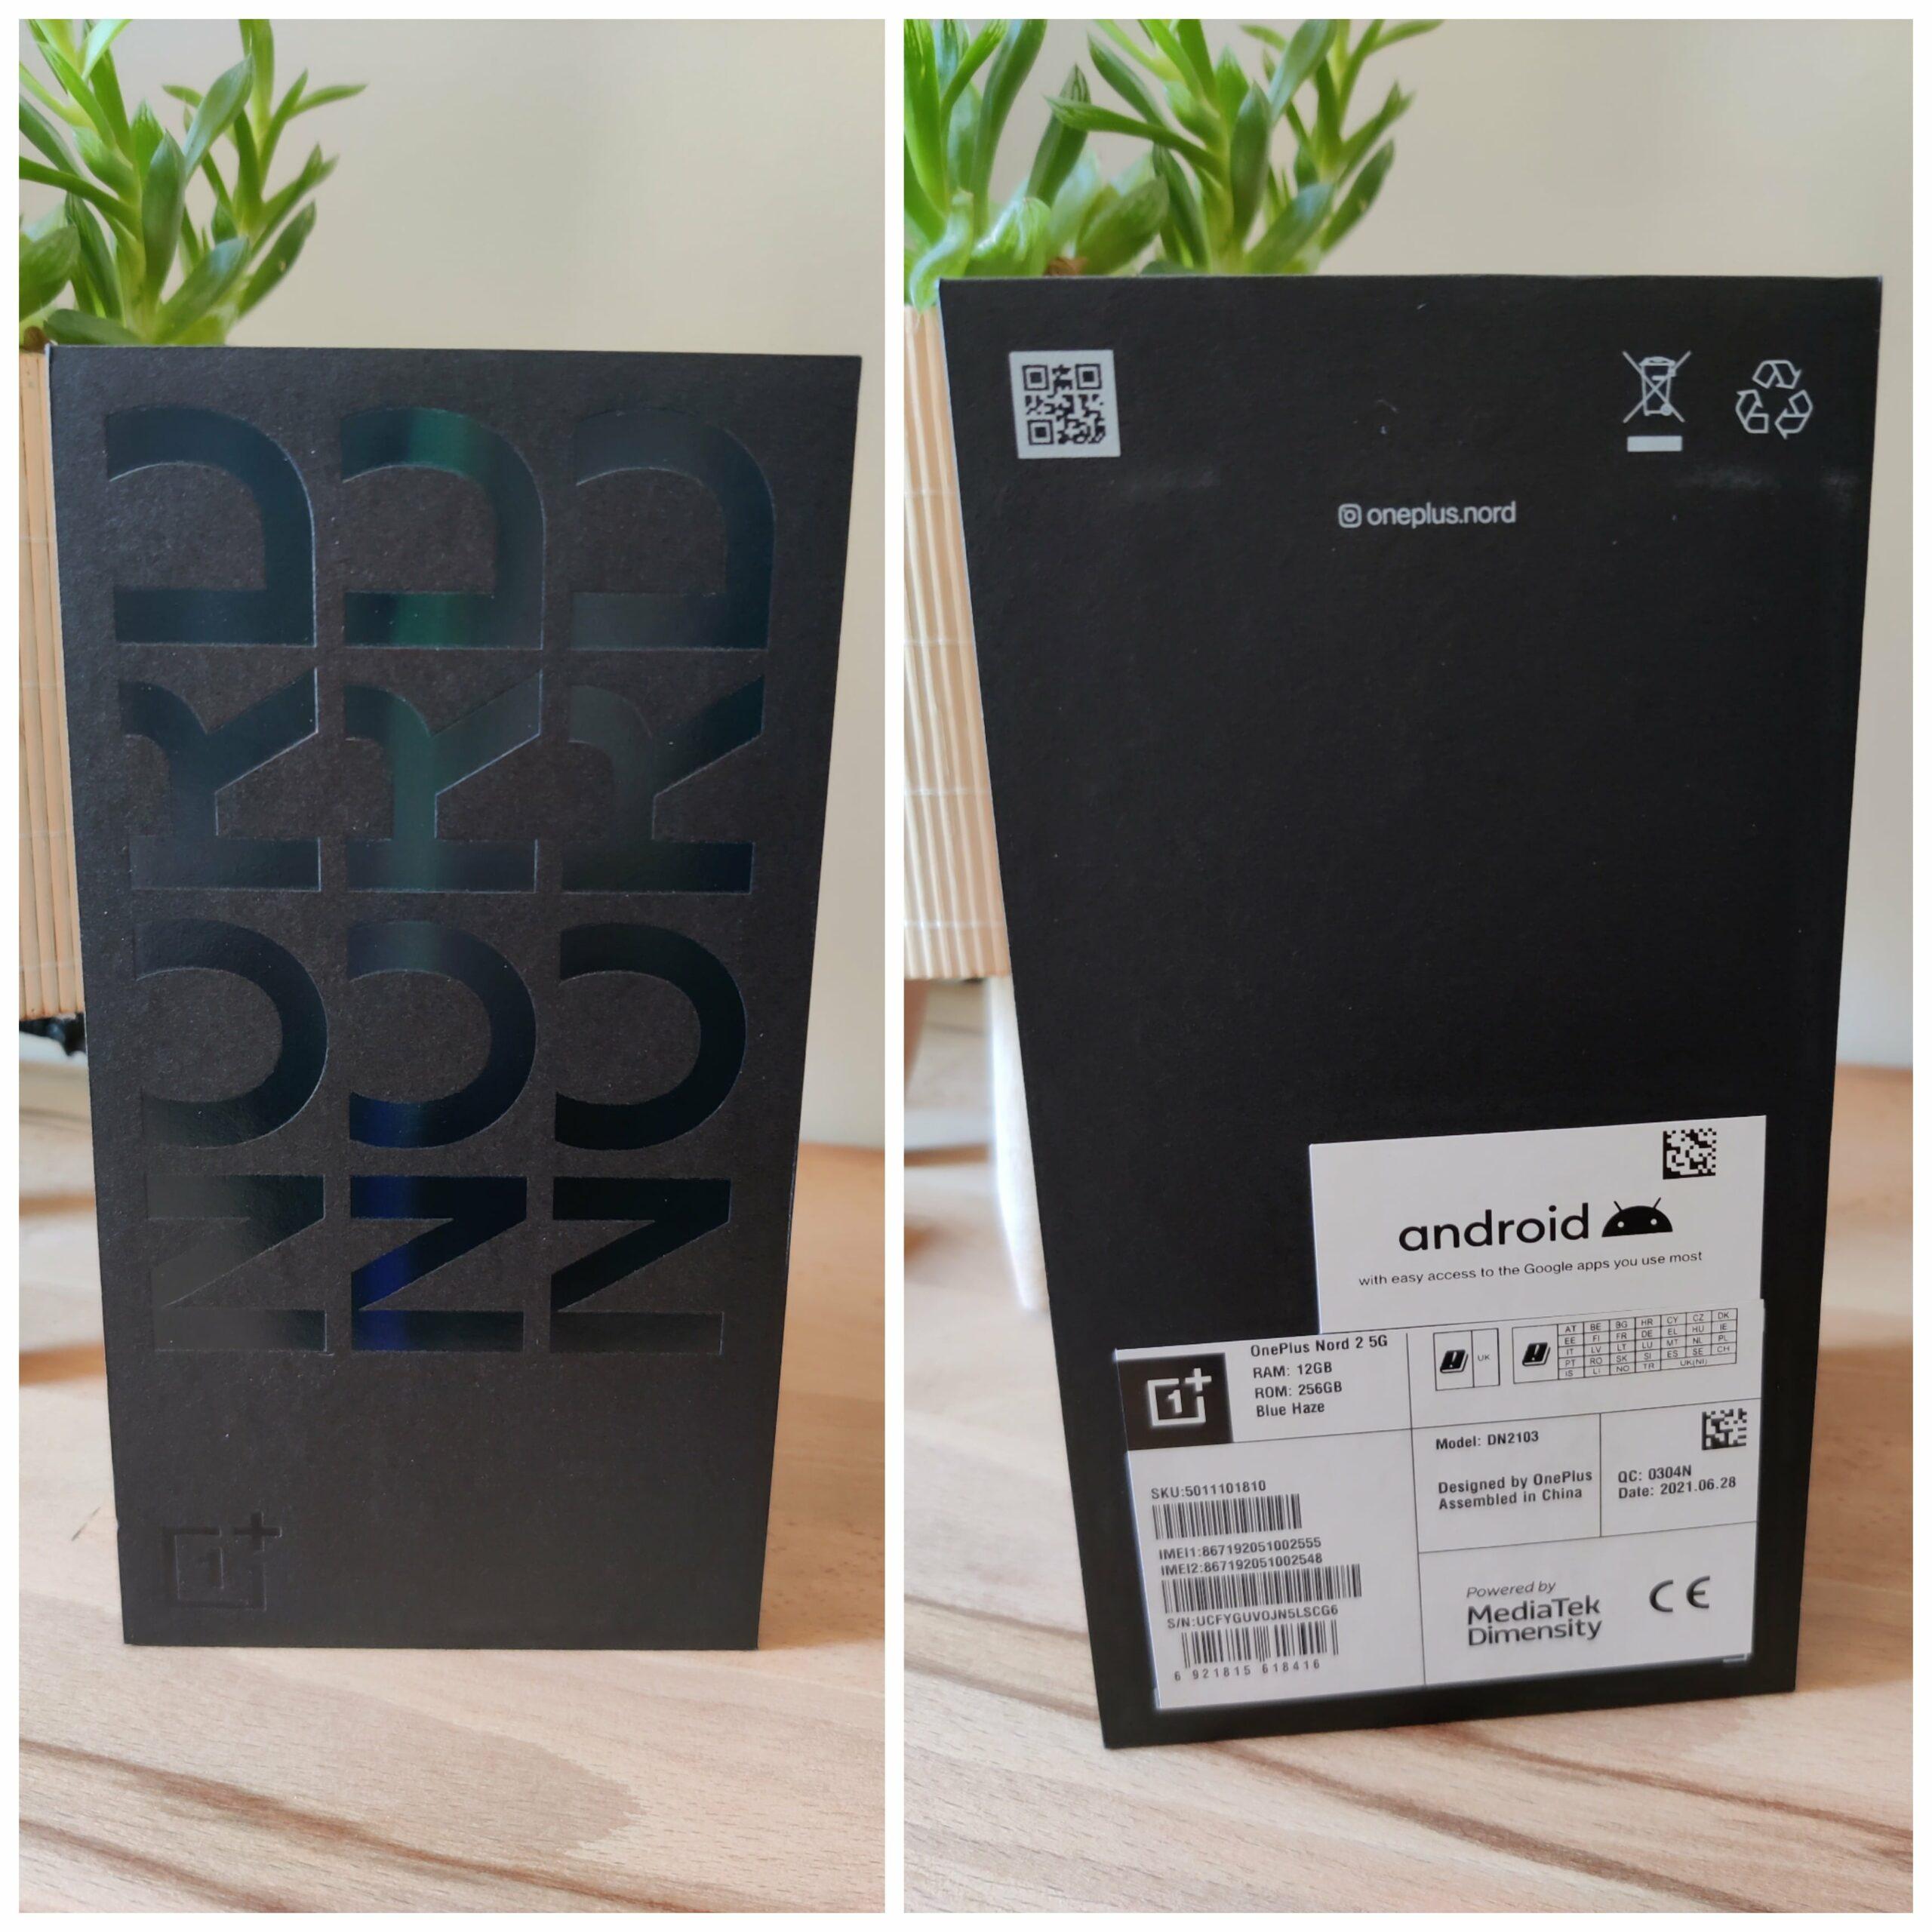 OnePlus Nord 2 box